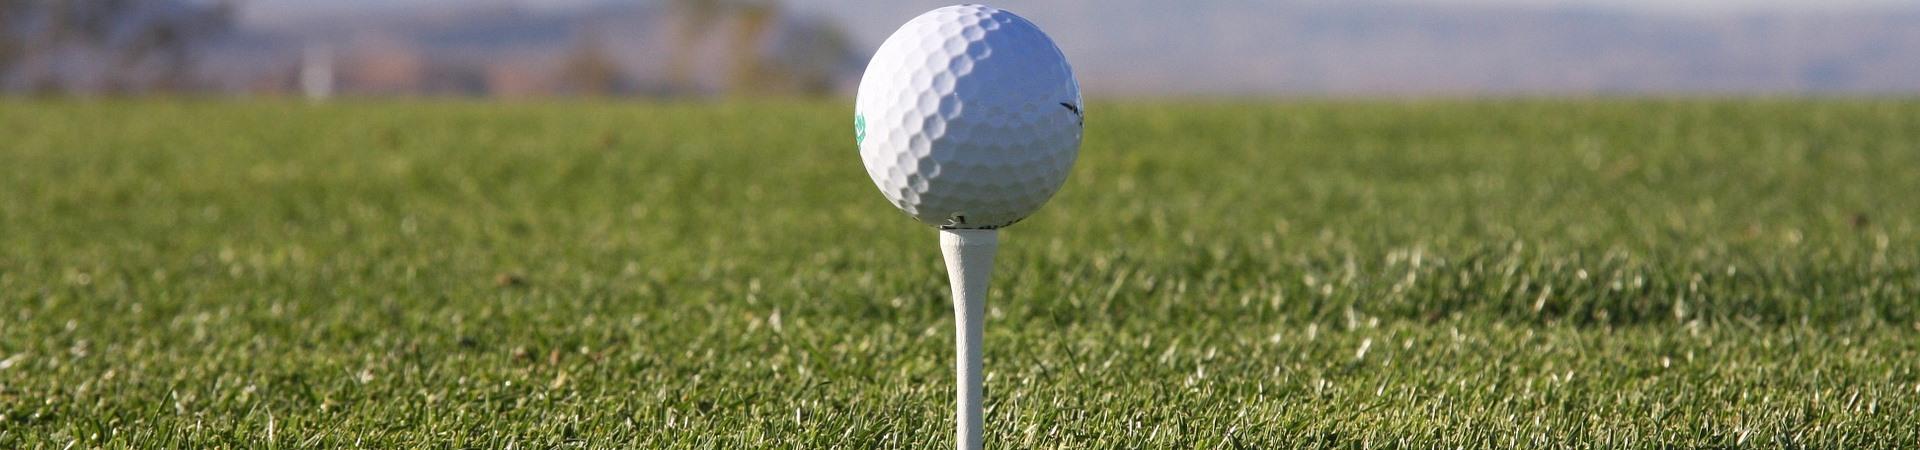 Golf 880532 1920